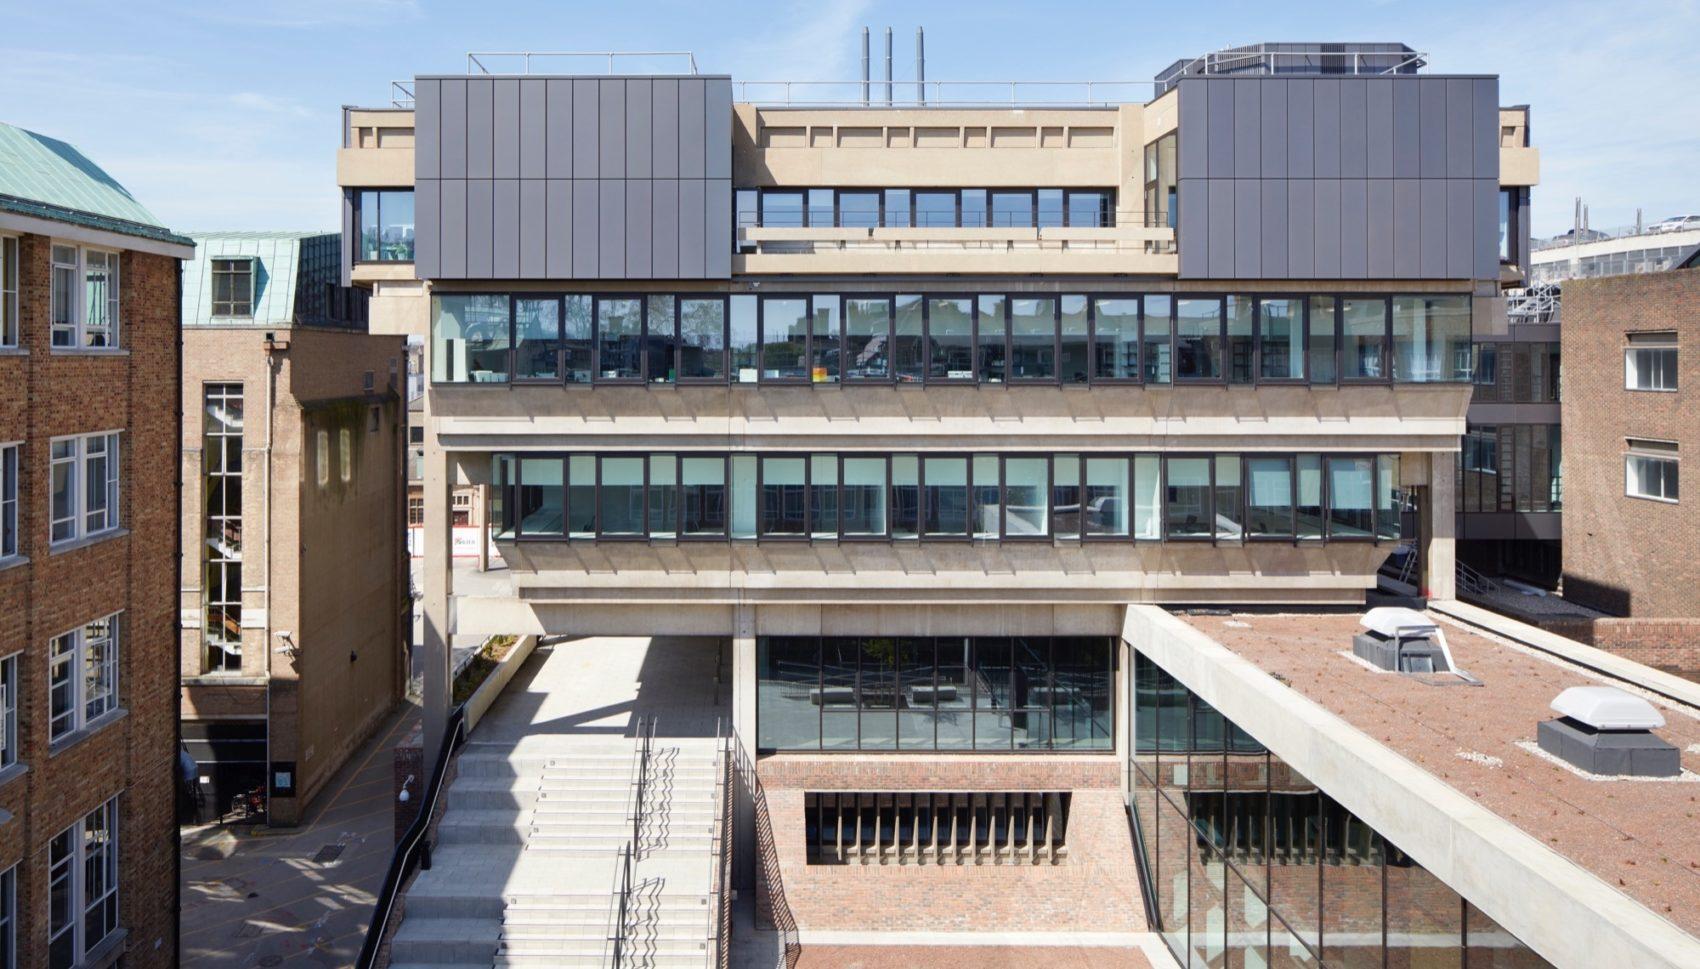 The David Attenborough Building